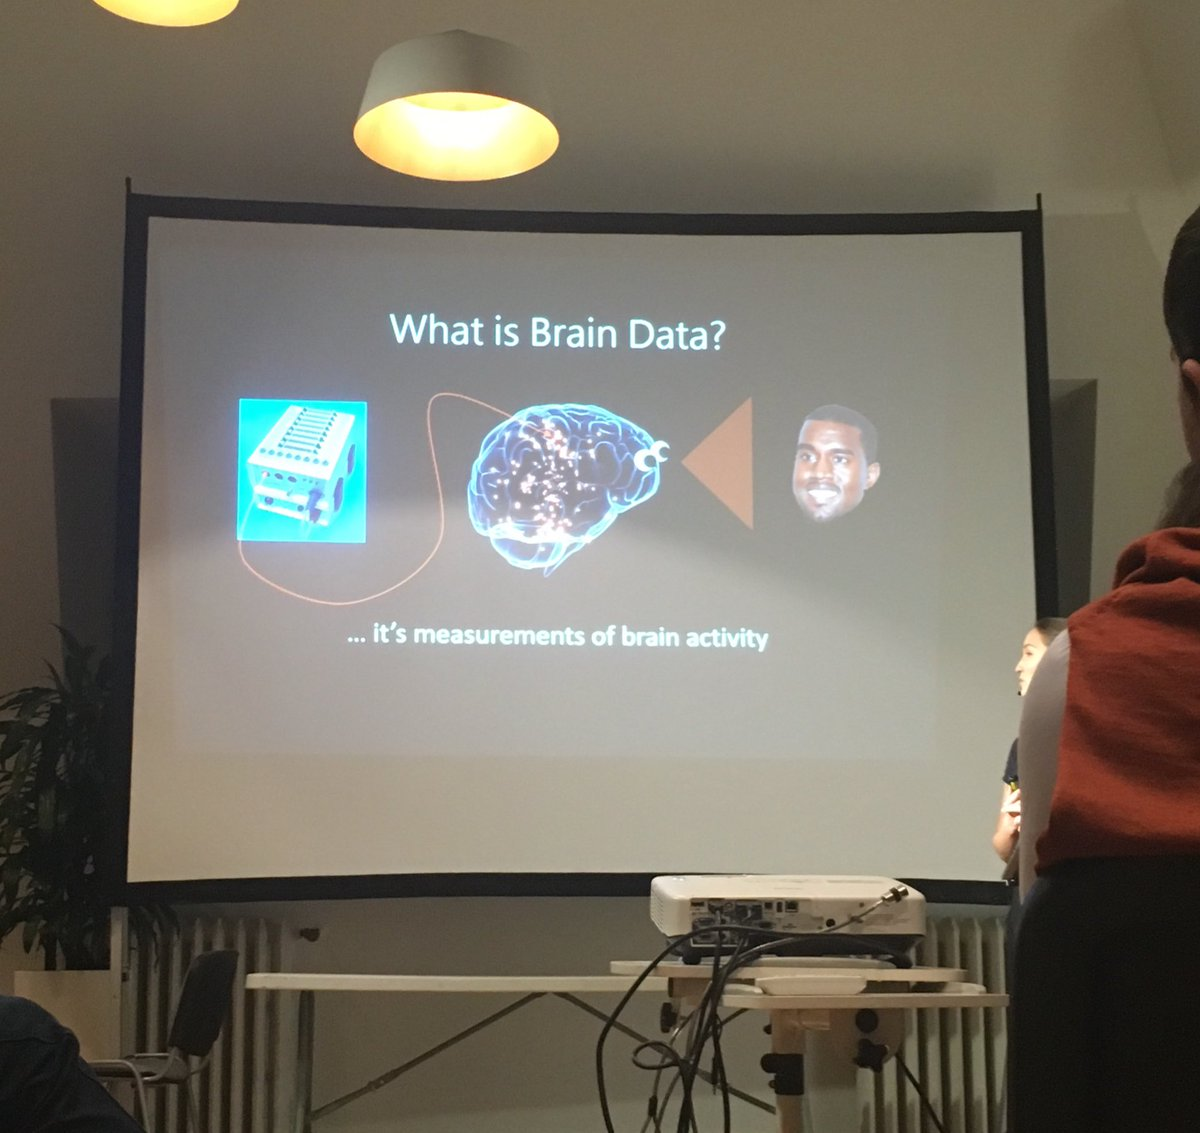 #DataBeers interesting mixture. Brain data talk now https://t.co/jJPC76j77h